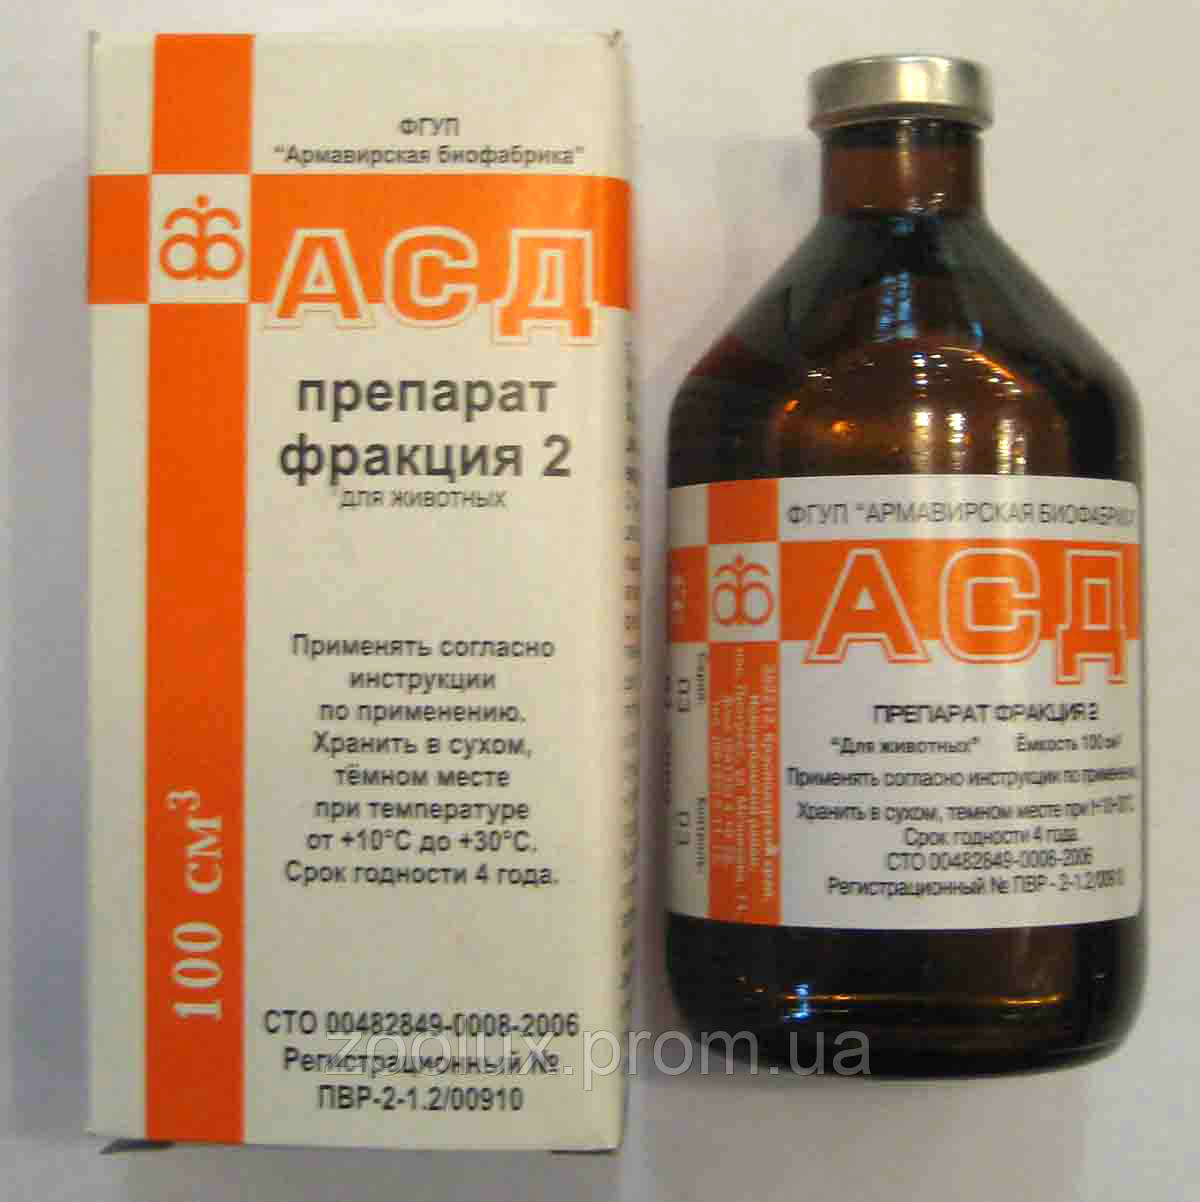 Асд 2 Армавир, цена 130 грн., купить в Киеве - Prom.ua (ID# 473847)